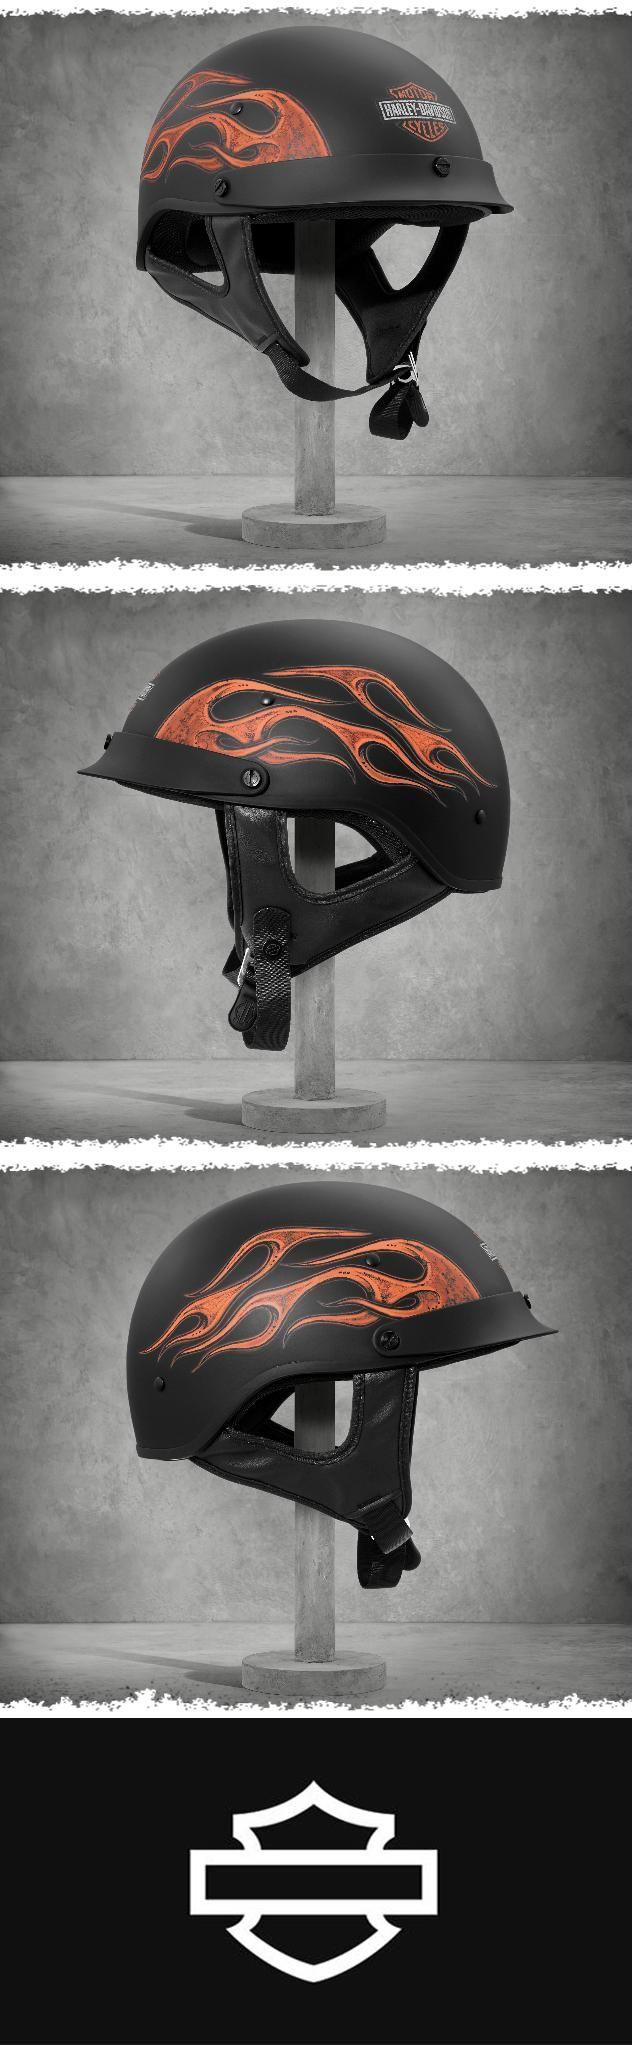 Fit, style, and comfort. | Harley-Davidson Wheeler Half Helmet